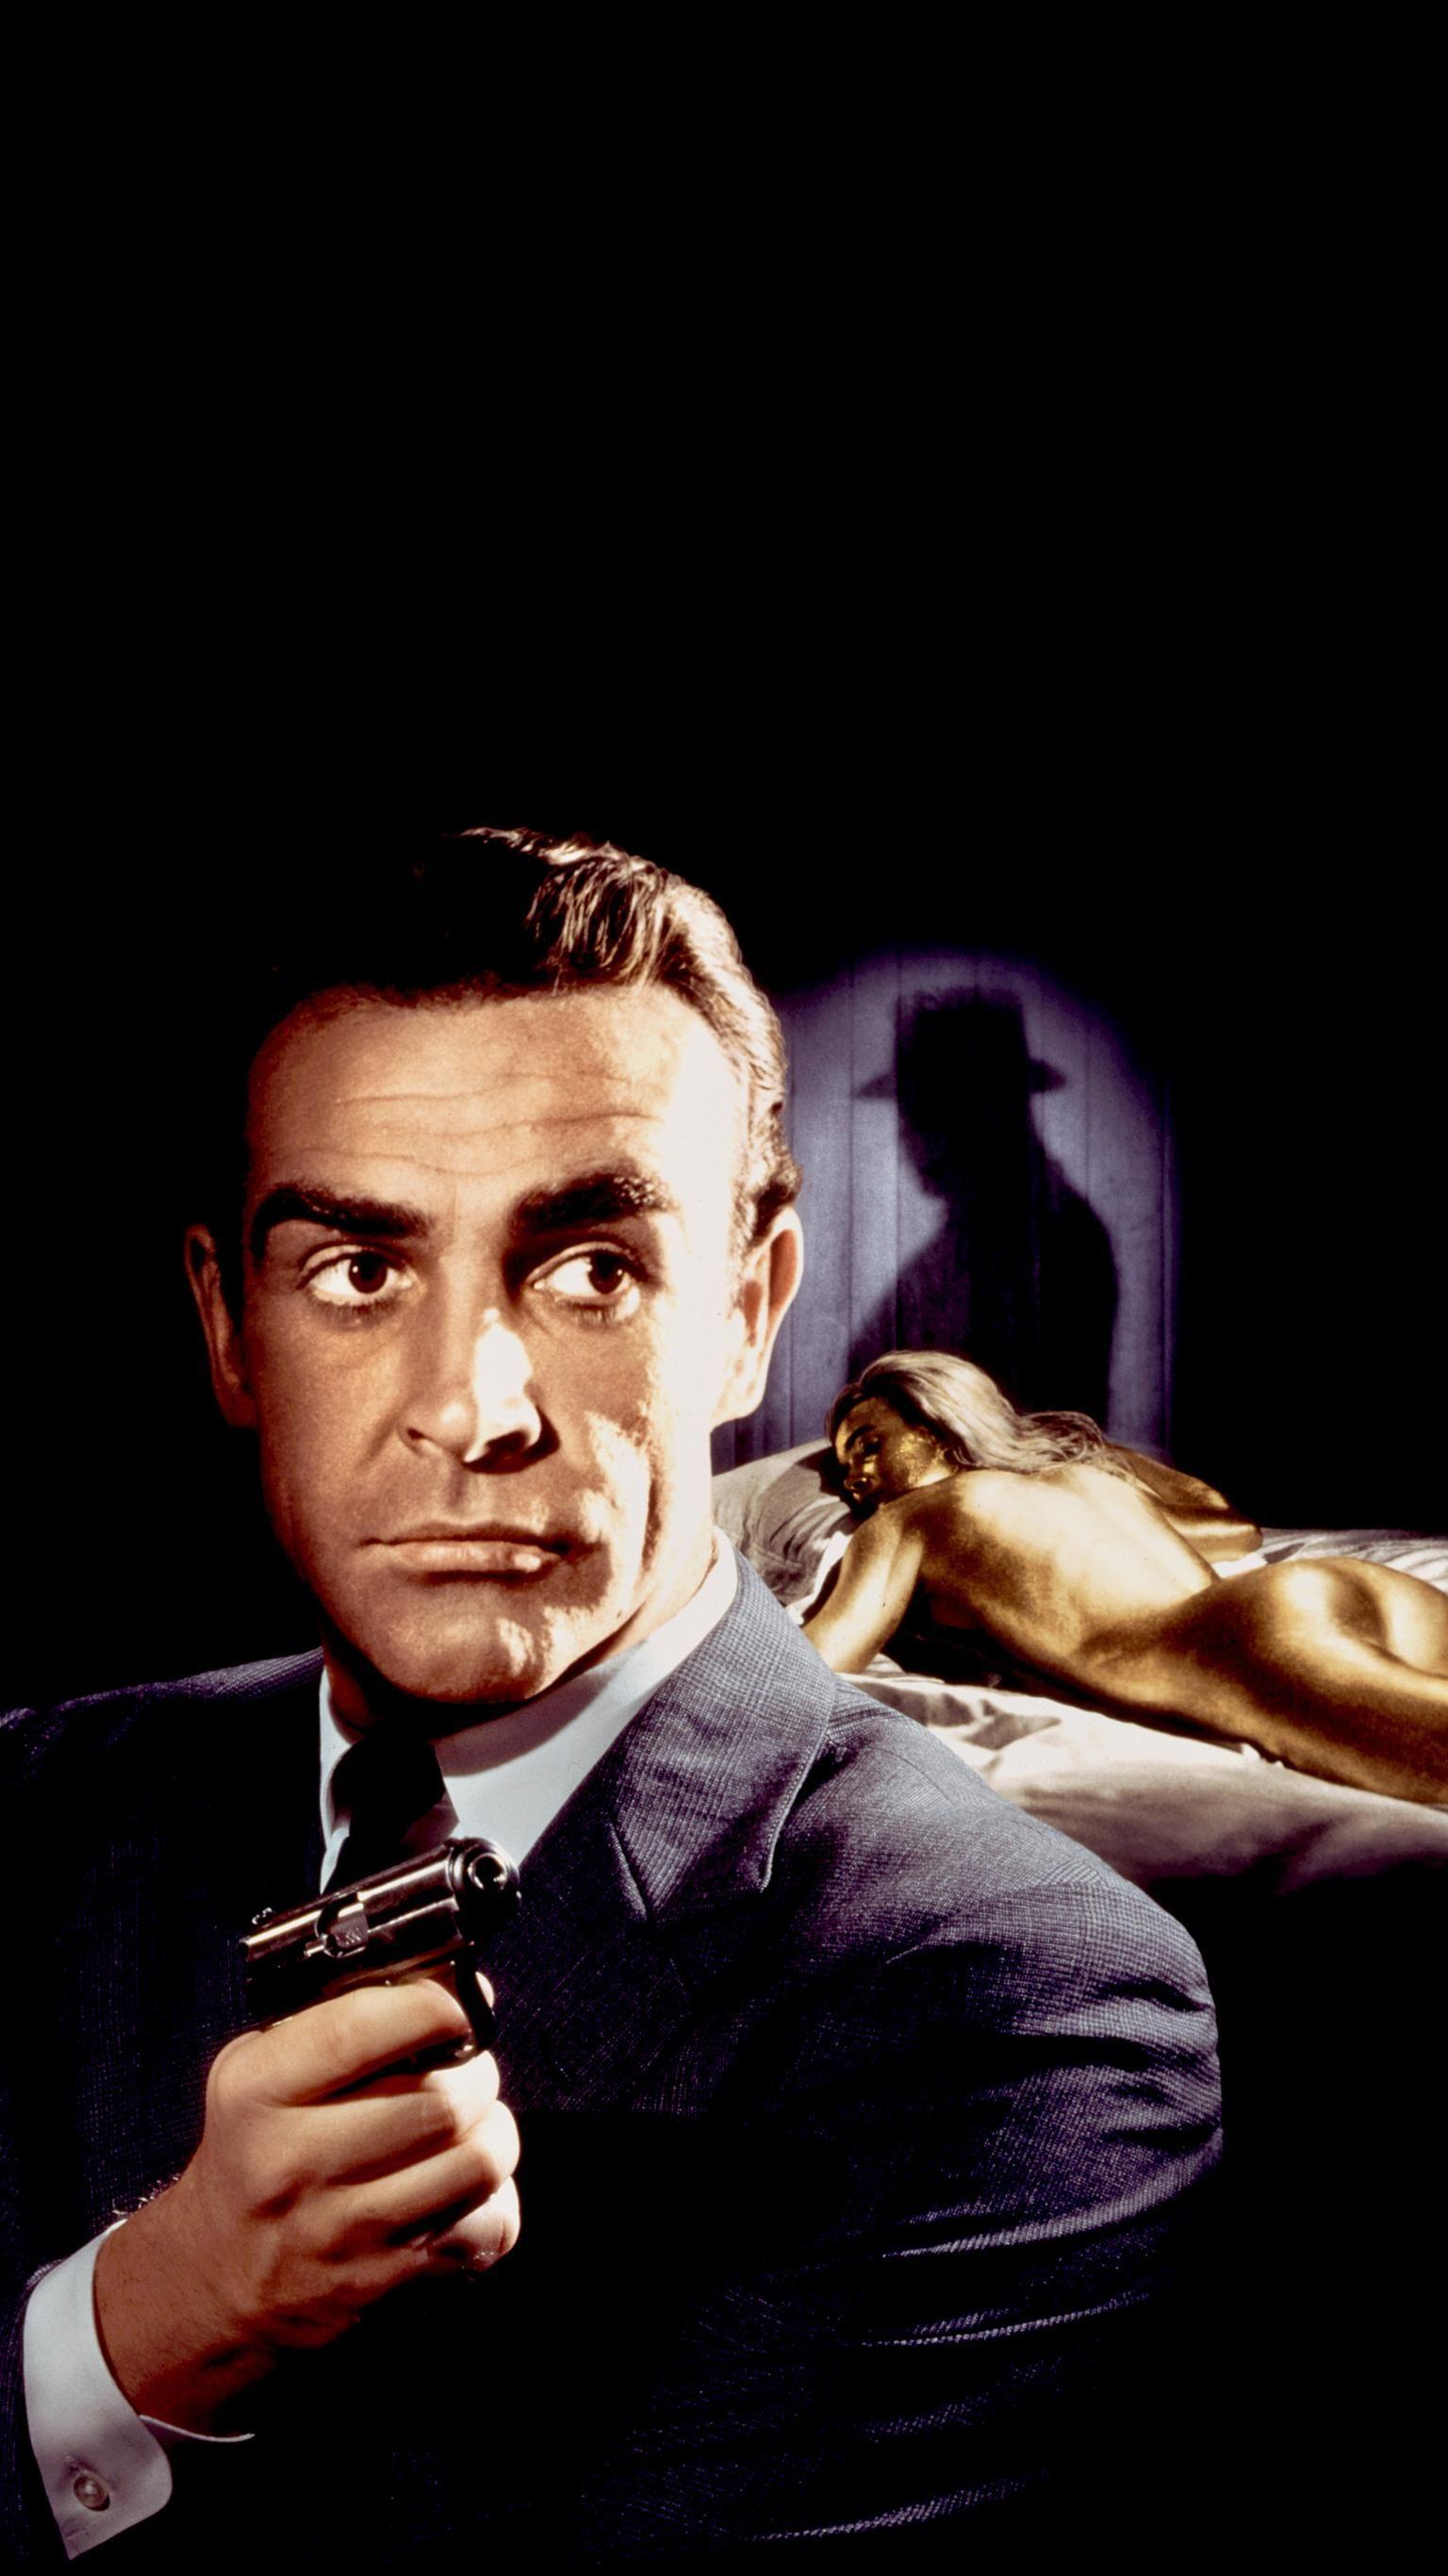 Pin on James Bond